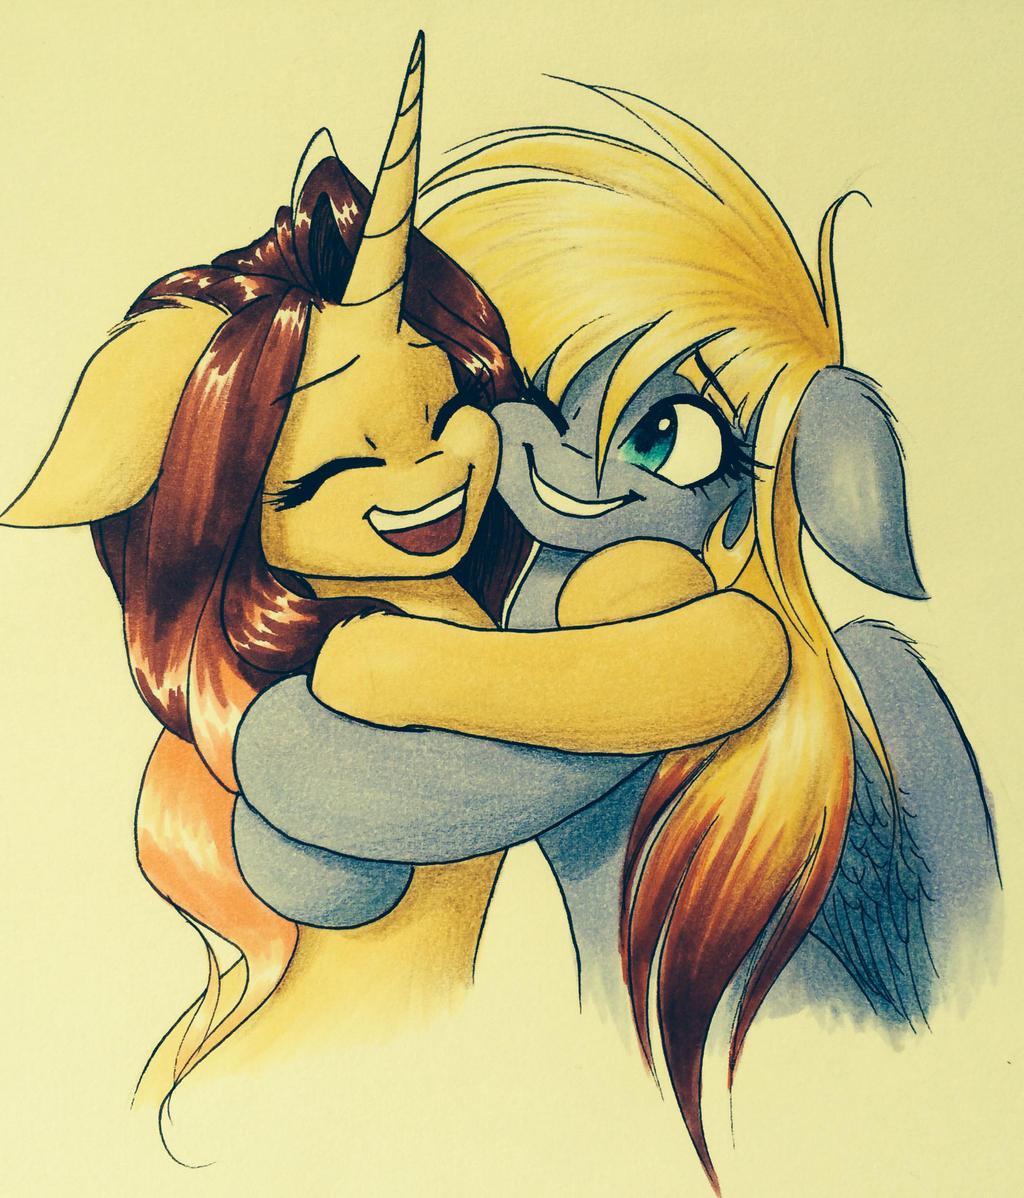 Hugs for Avi by Katputze